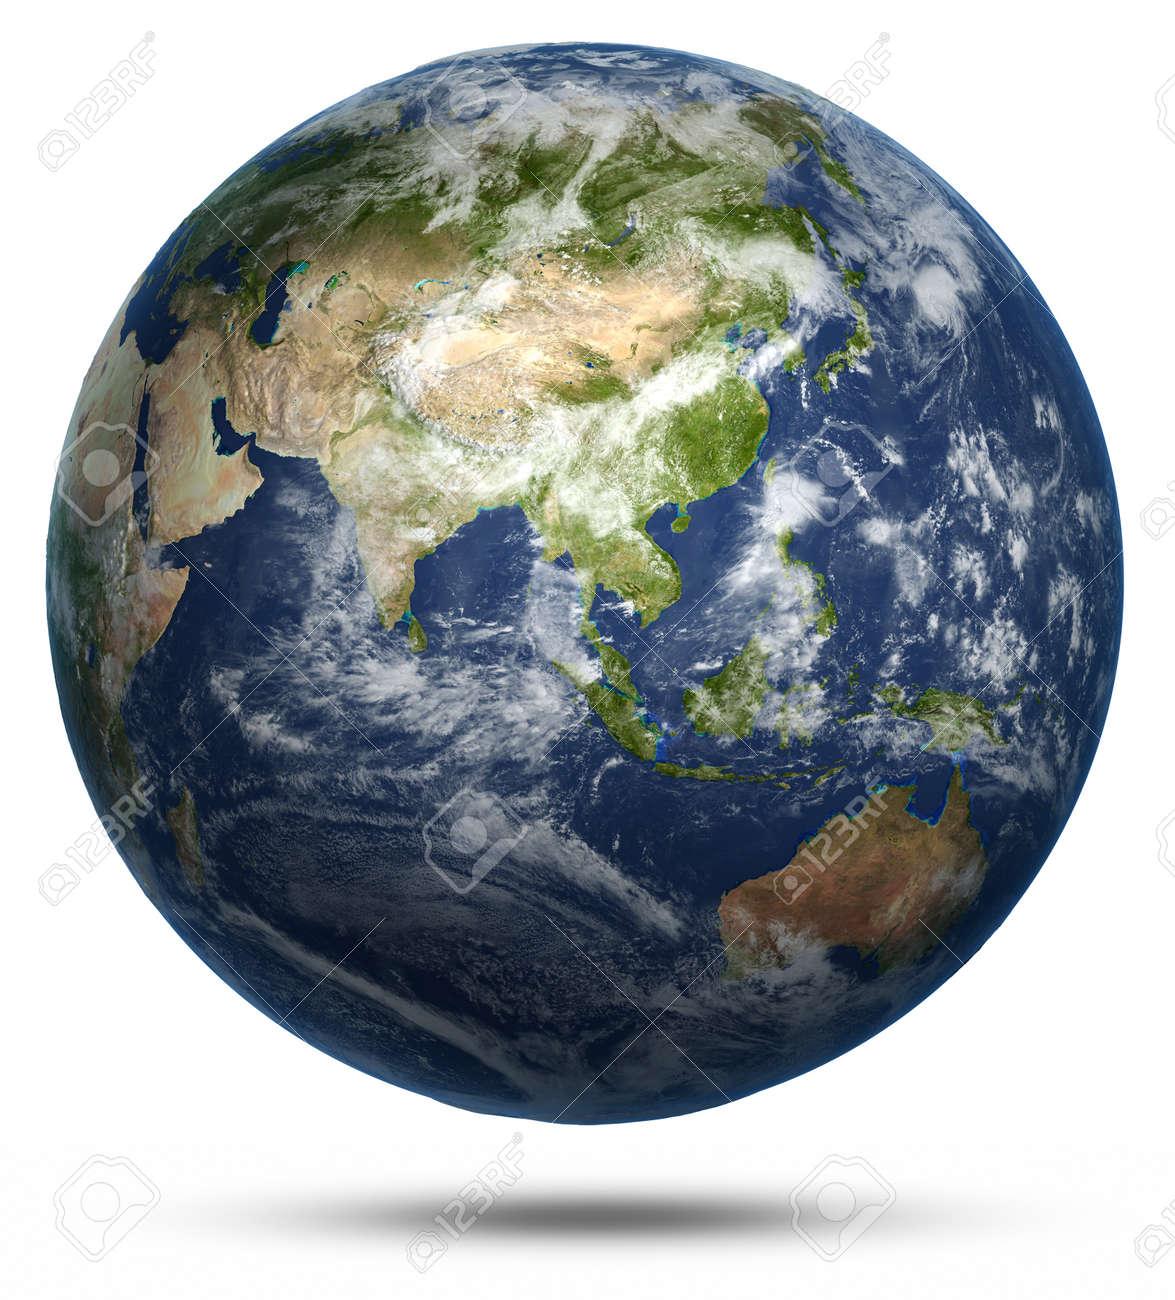 Asia And Australia World Map Earth Globe Model Maps Courtesy - Earth globe map